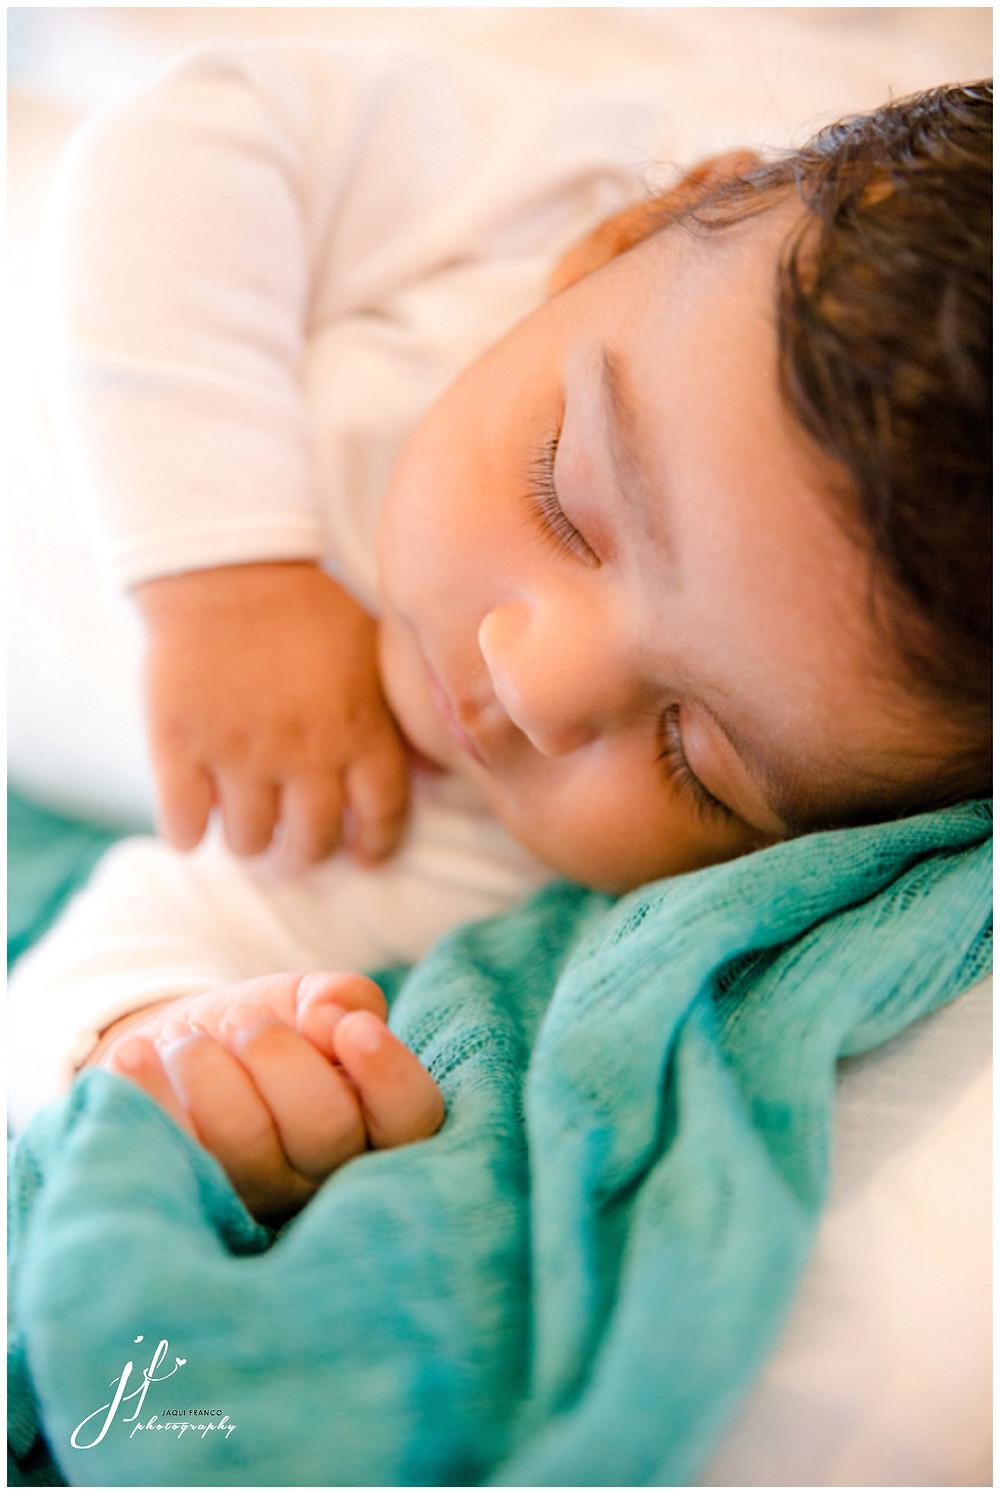 Newborn detail shots by Jaqui Franco Photography Cape Town